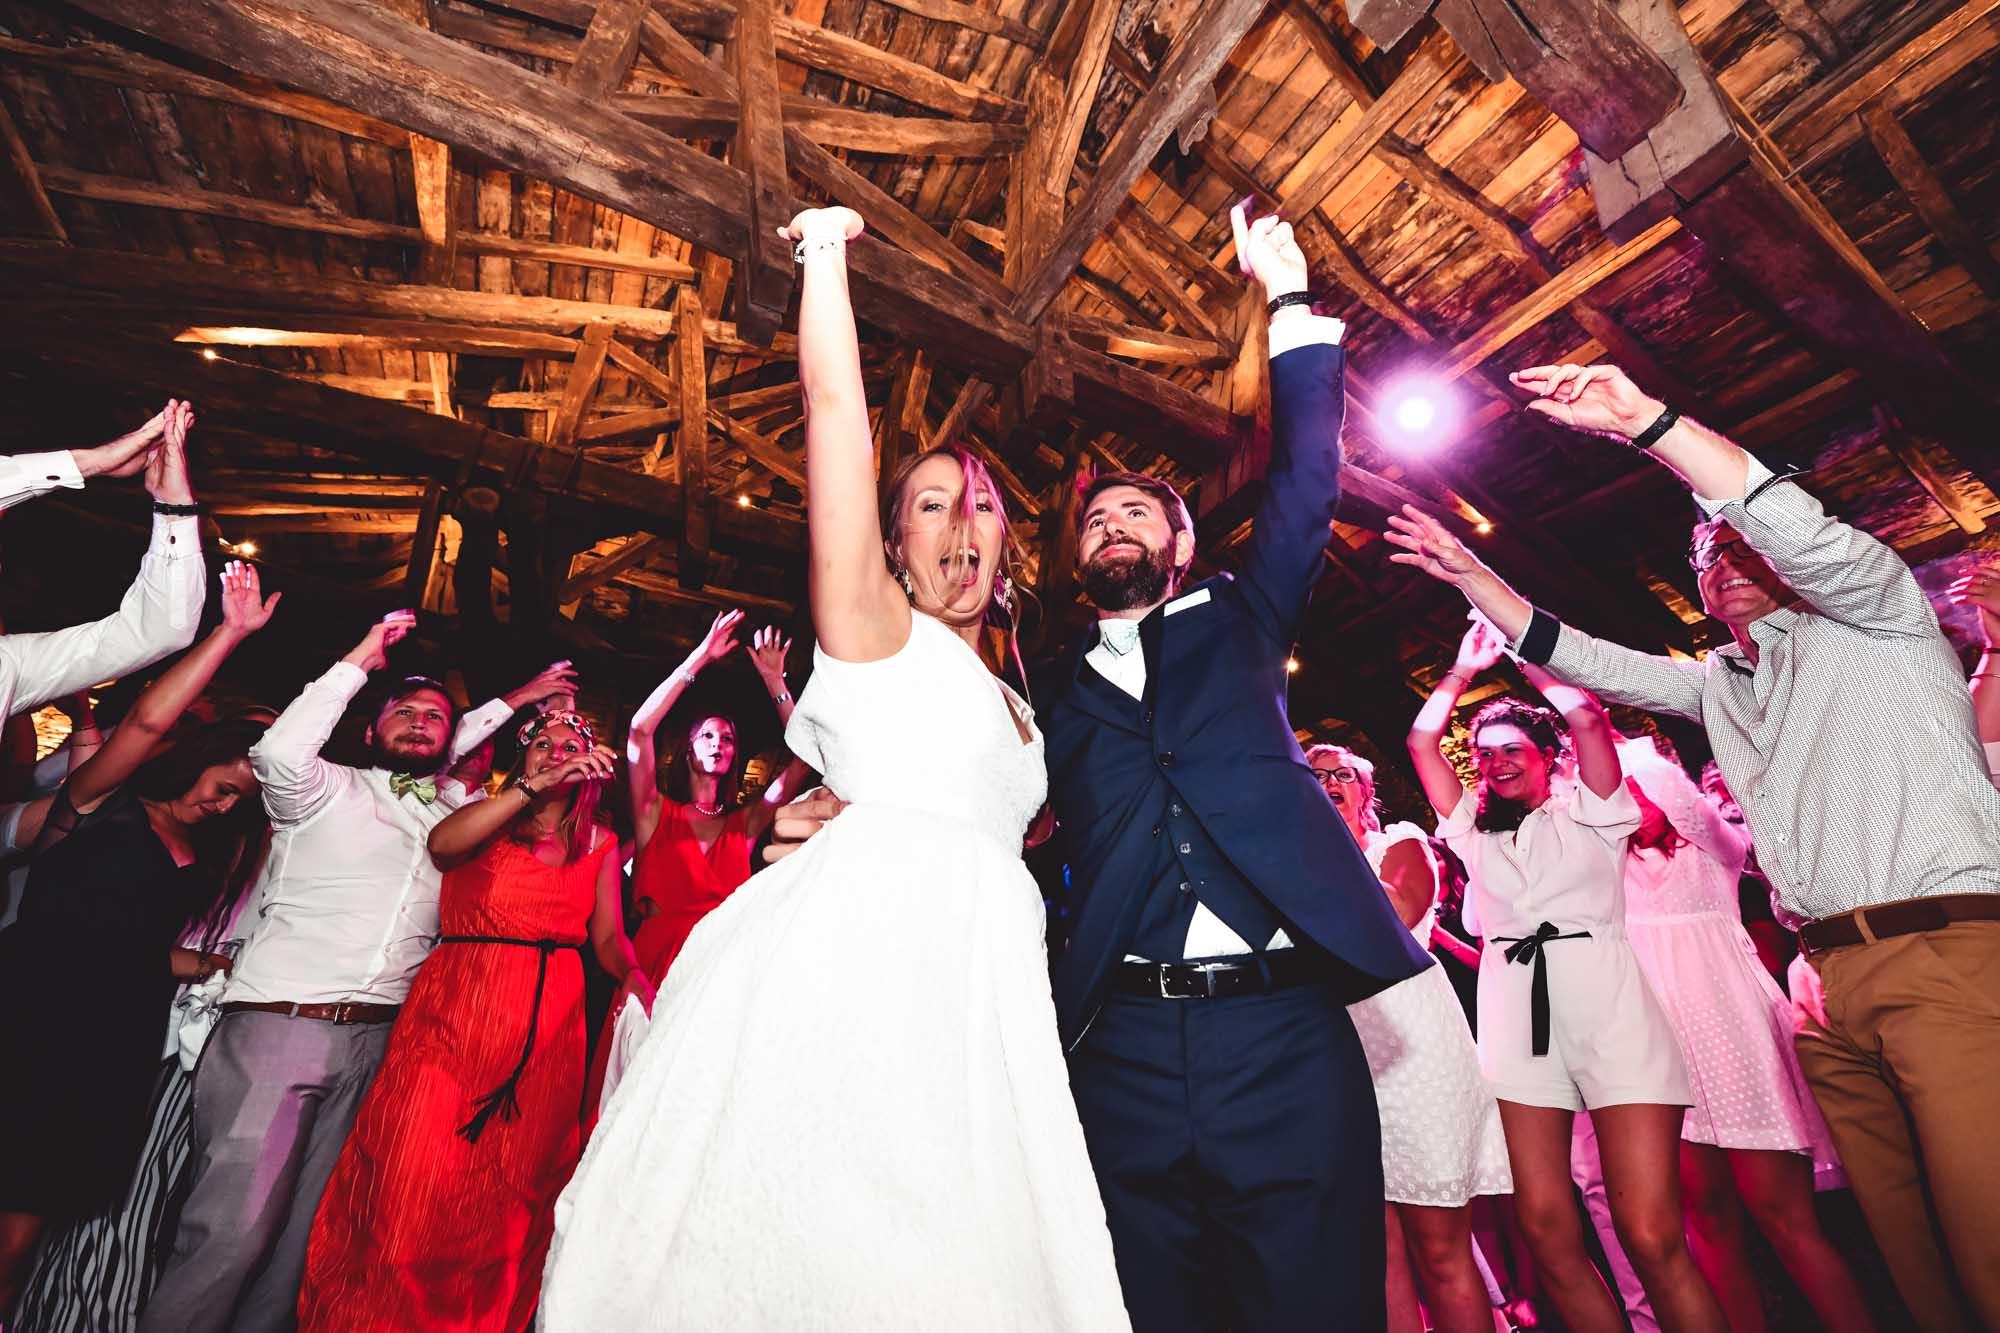 2018-07-21 - LD8_0795 - photographe mariage lyon - laurie diaz - www.lauriediazweeding.com.jpg